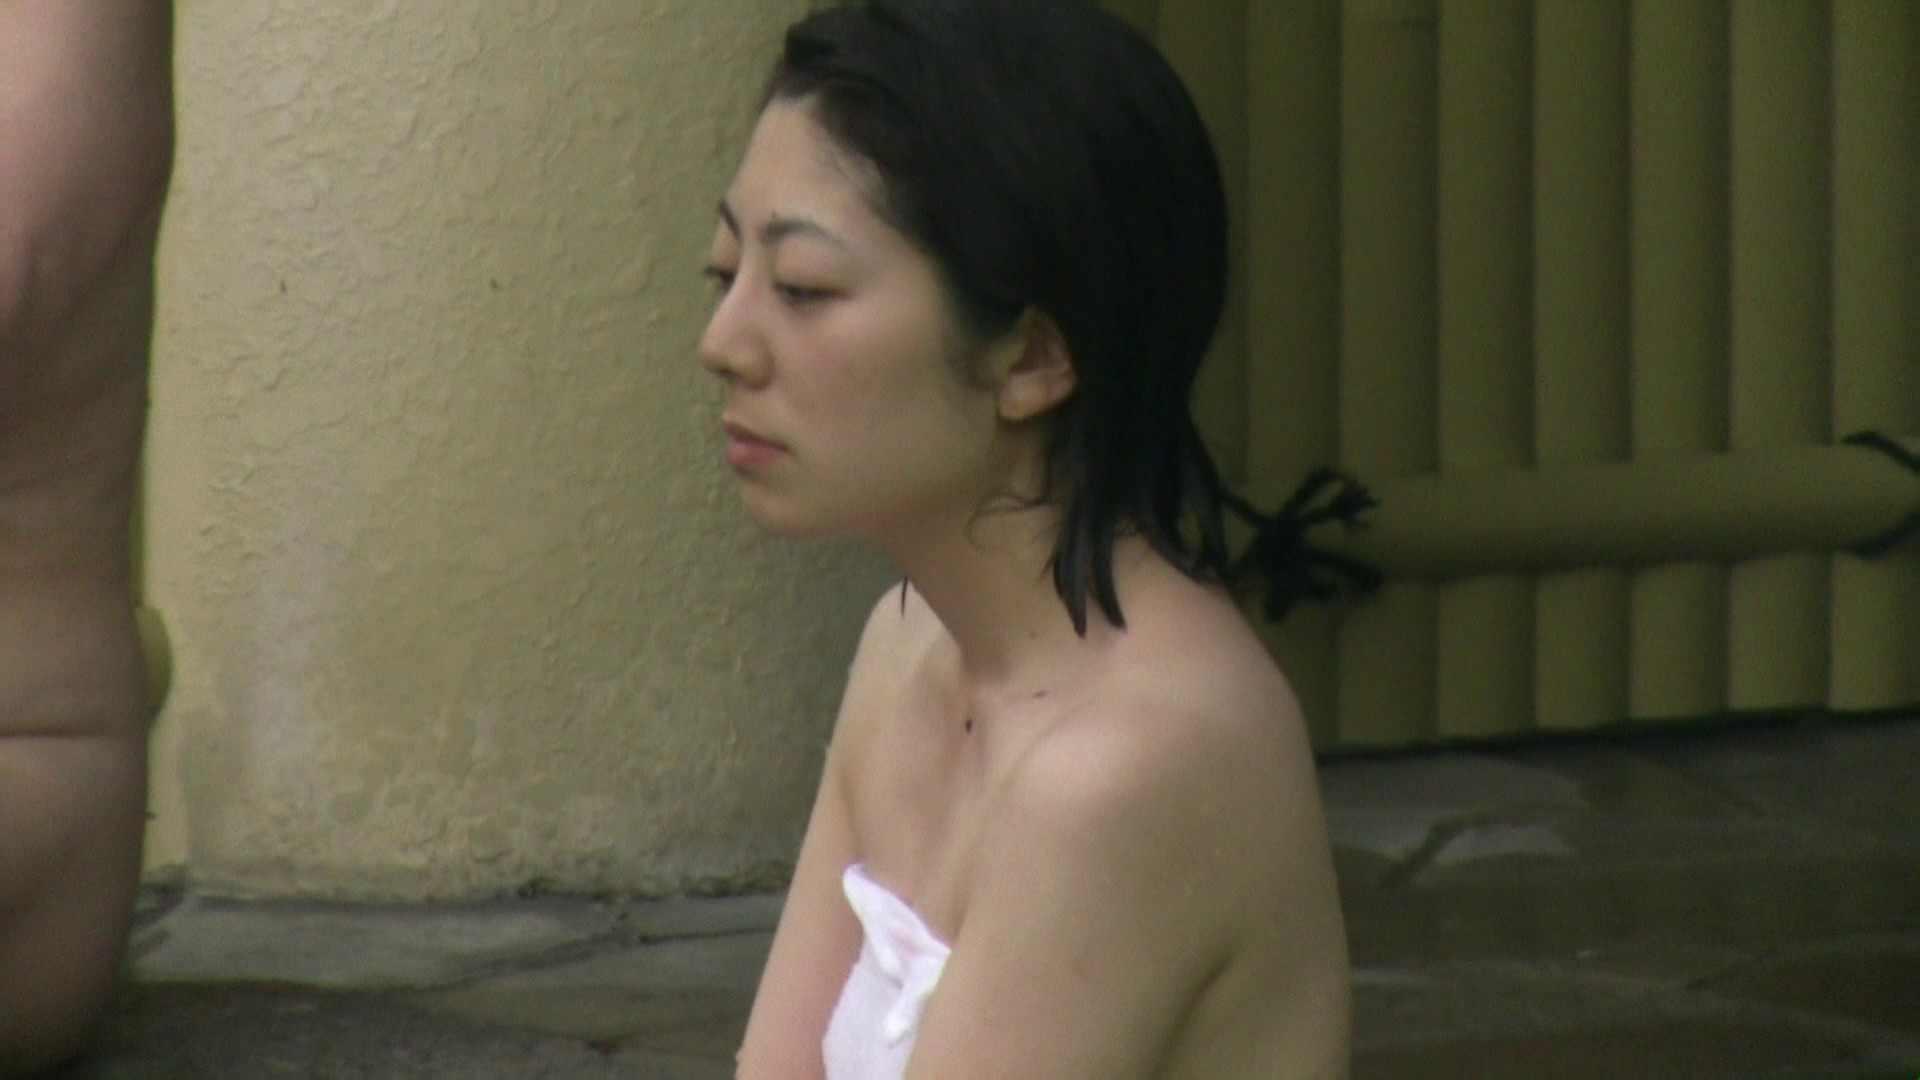 Aquaな露天風呂Vol.04 露天風呂編 | 盗撮シリーズ  94PIX 47